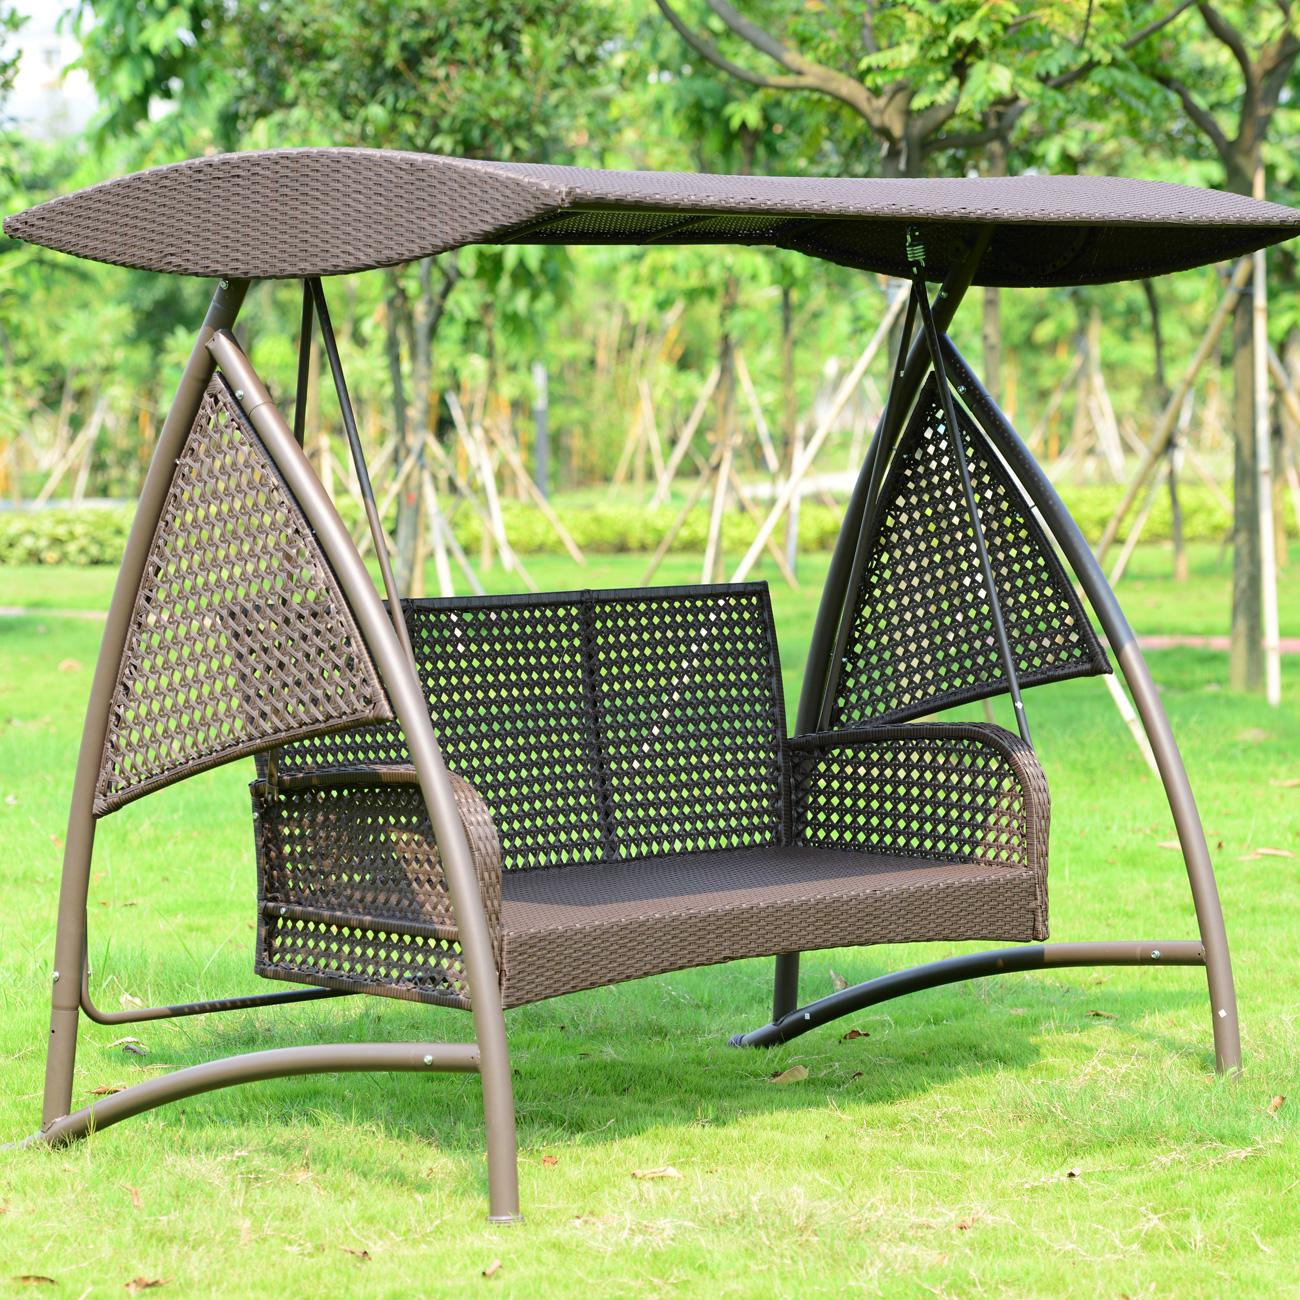 fauteuil suspendu balan oire promotion achetez des fauteuil suspendu balan oire promotionnels. Black Bedroom Furniture Sets. Home Design Ideas